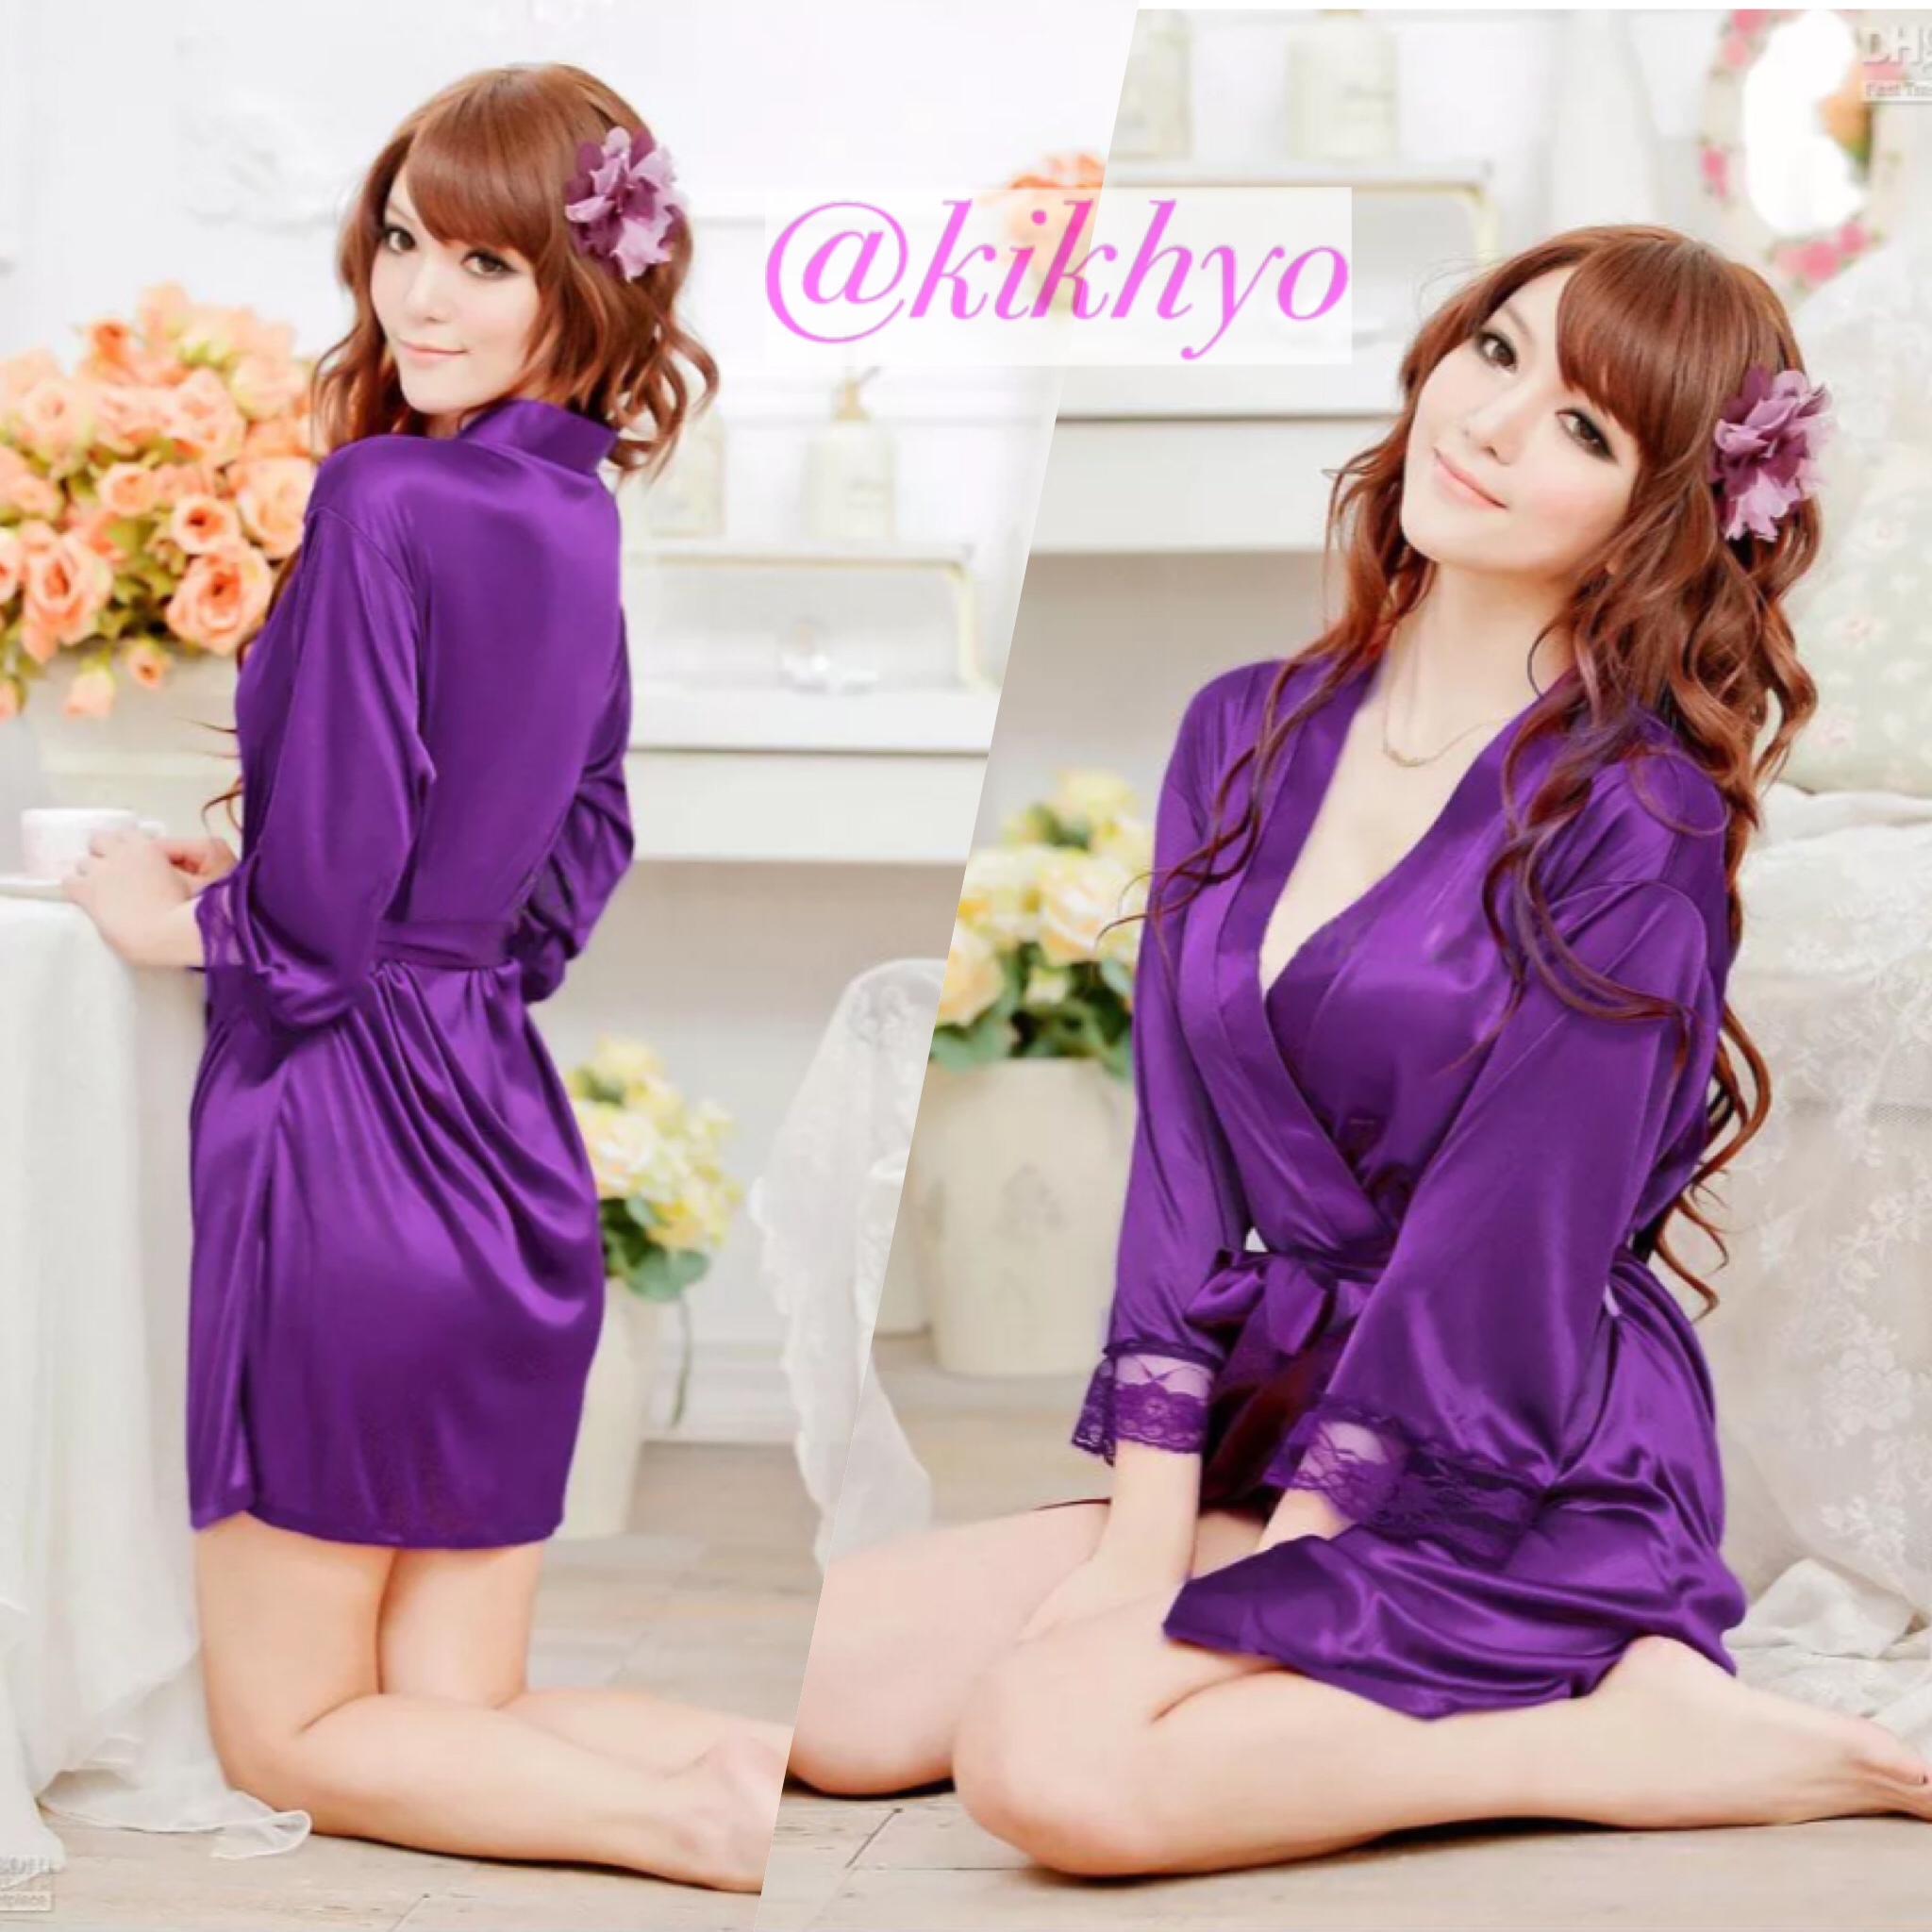 PROMO Sexy Lingerie Kimono Sleepwear G string Baju Tidur Murah Olshop .